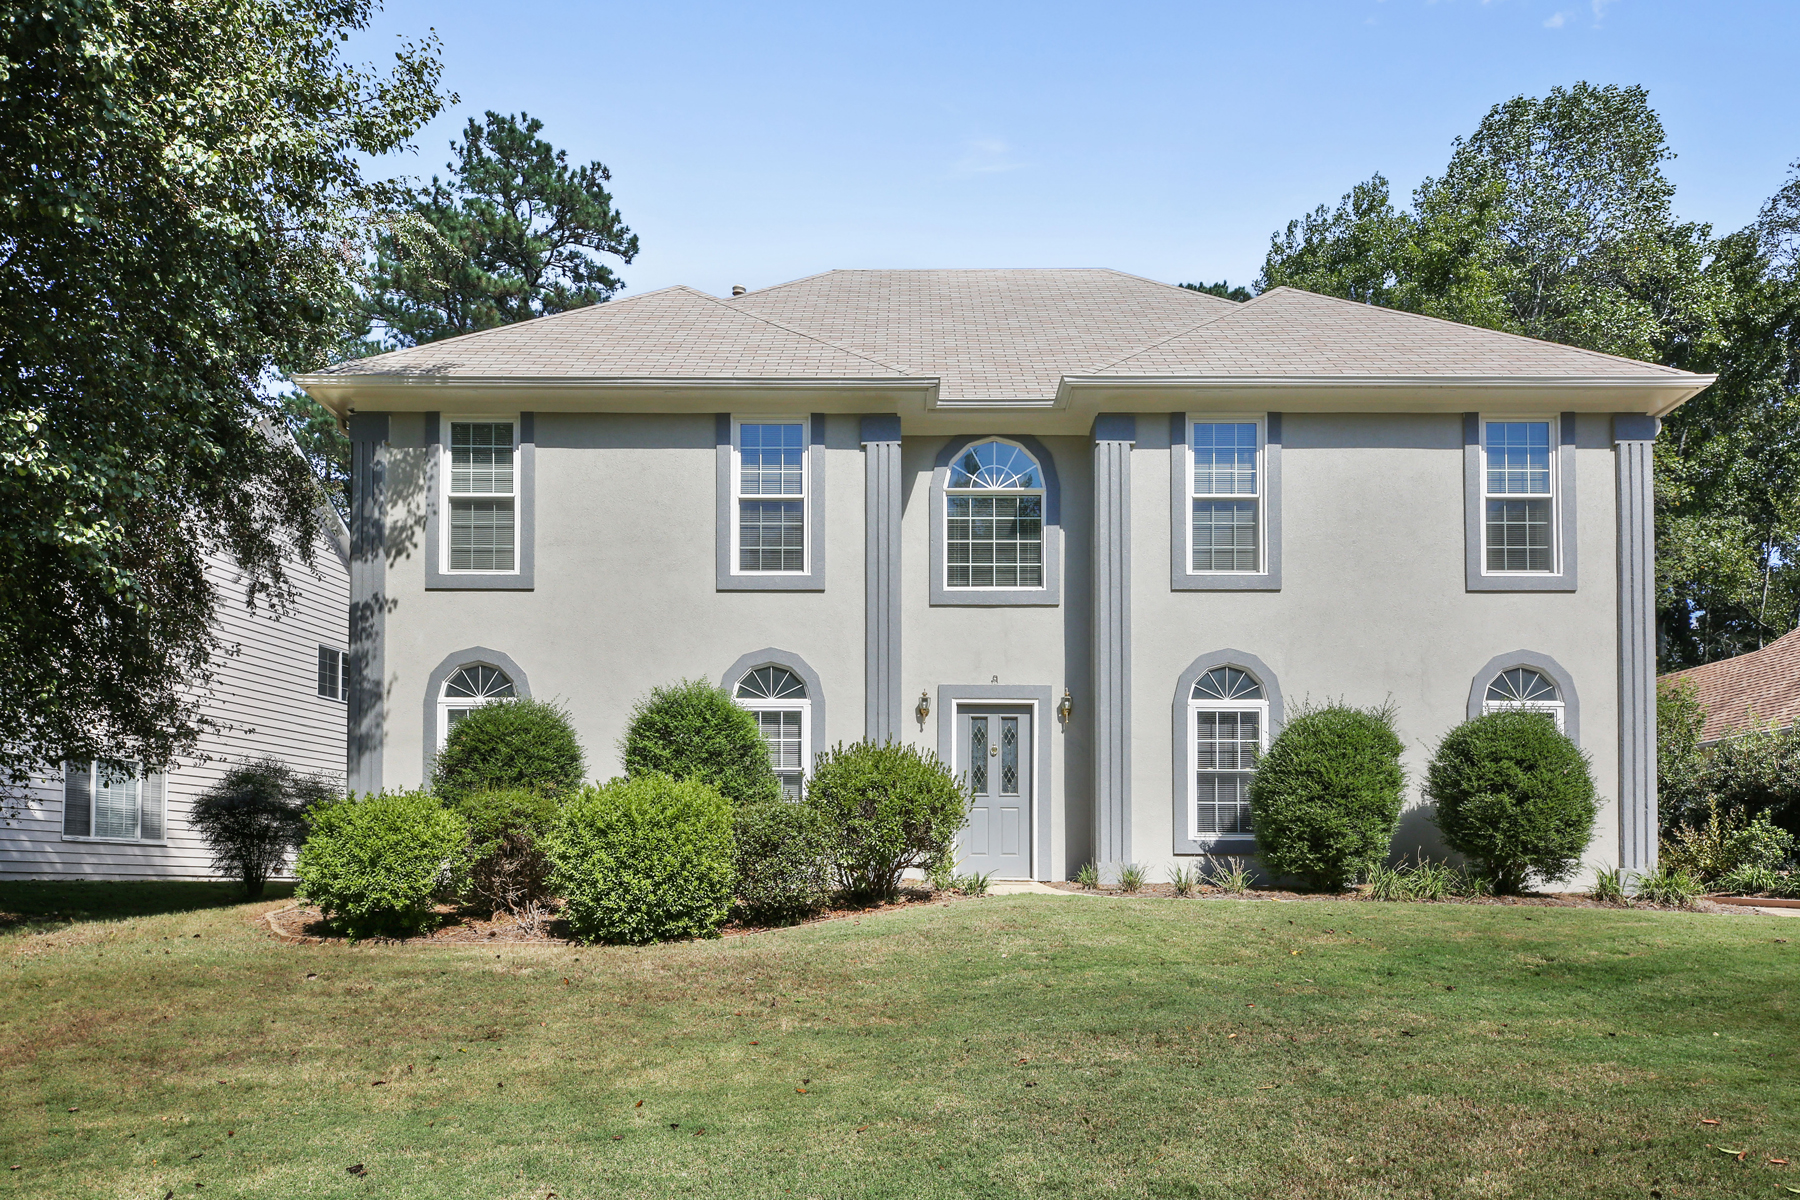 Single Family Home for Sale at Move-In Ready Alpharetta Home 11785 Aspen Forest Dr Alpharetta, Georgia 30005 United States